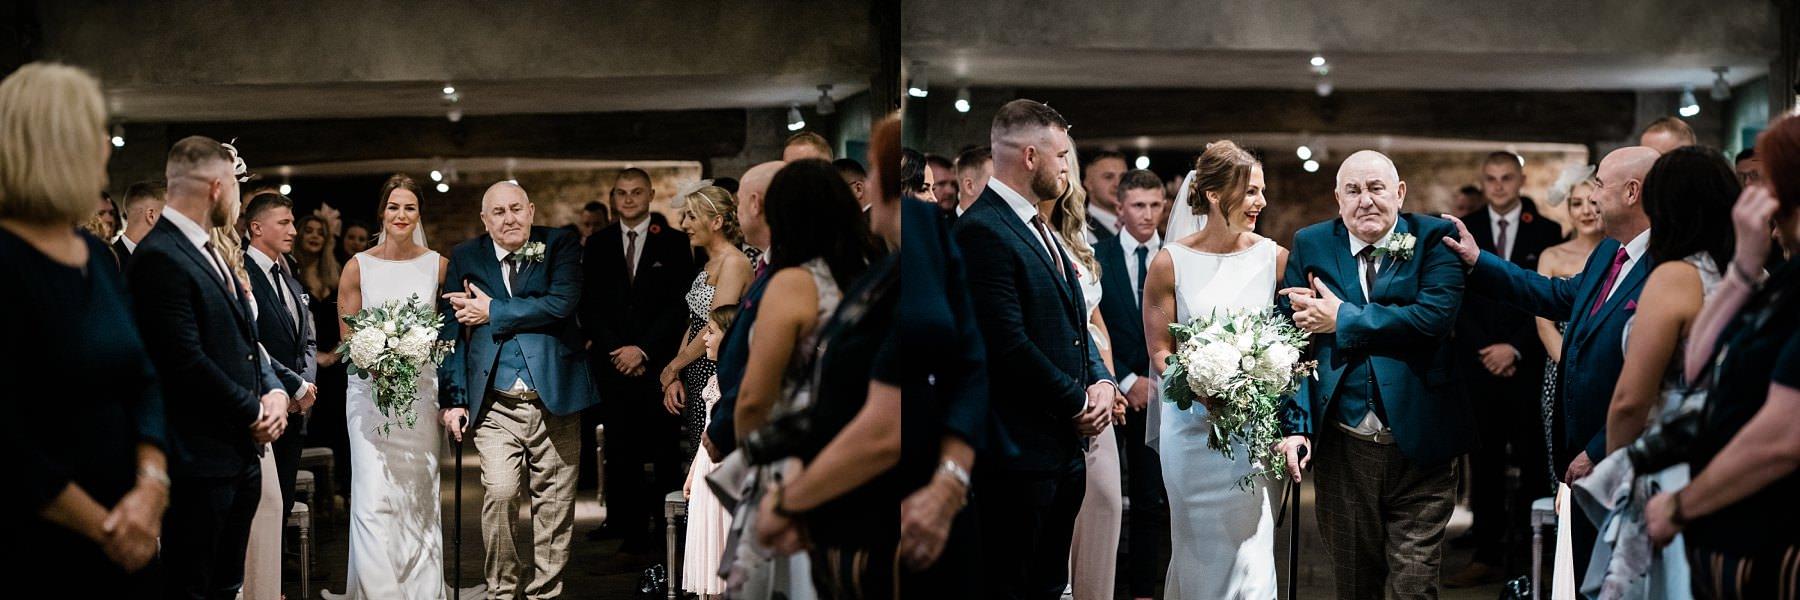 Bride walking down the aisle Le petite Chateau wedding - North East Wedding Photographer